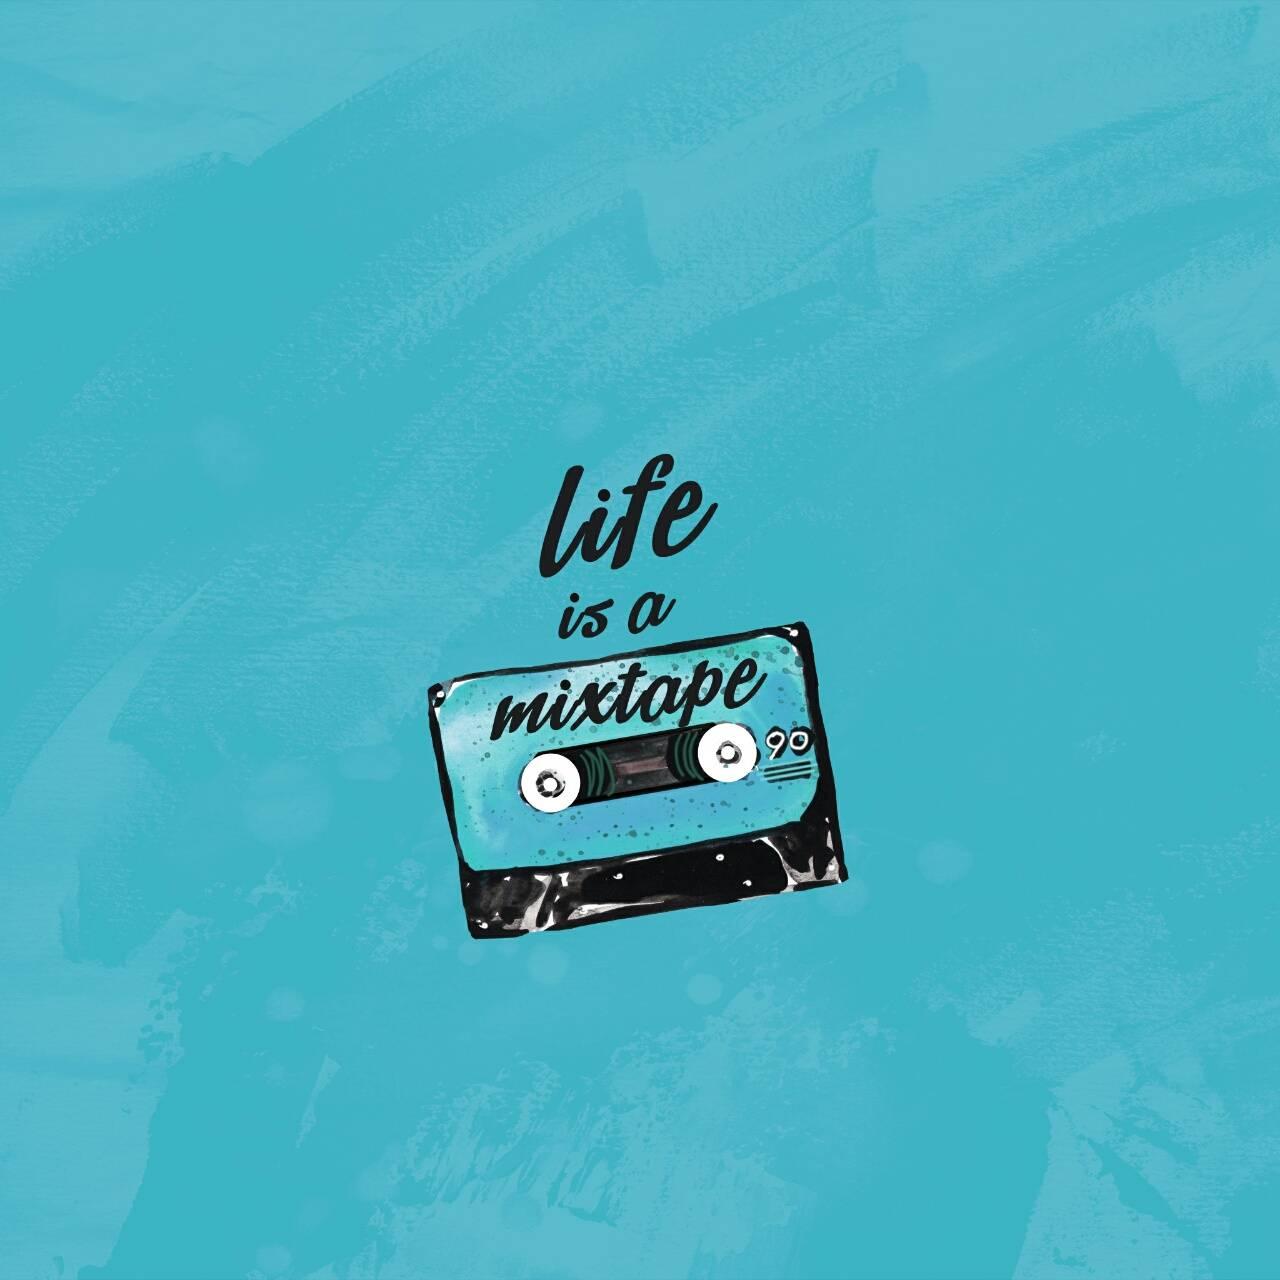 Mixtape wallpaper